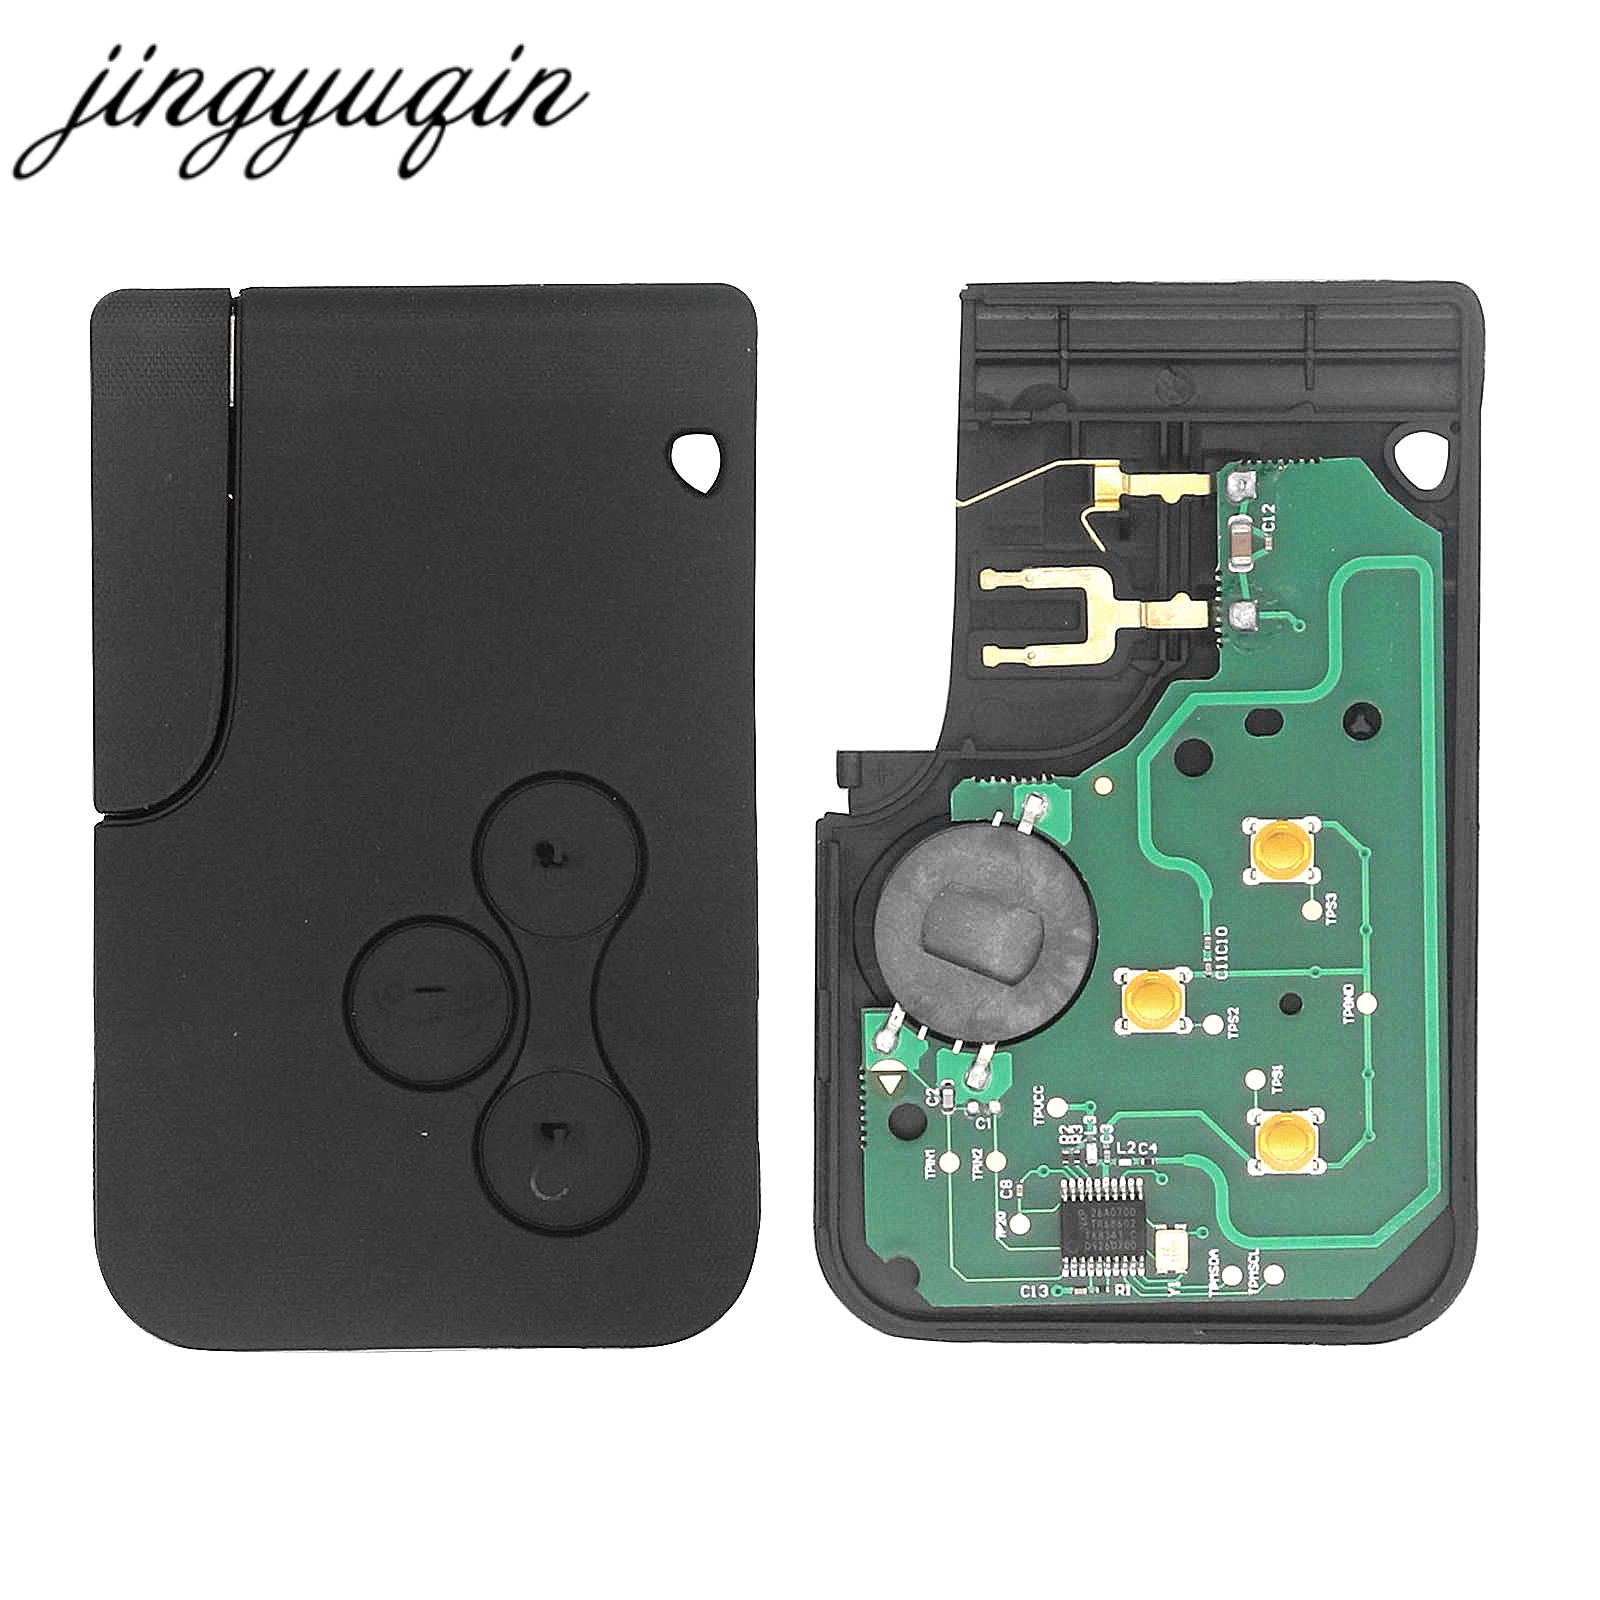 Jingyuqin Smart Schlüssel Karte für Renault Megane II Scenic II Grand Scenic 2003-2008 433 mhz PCF7947 Chip ID46 3 taste Remote PCB